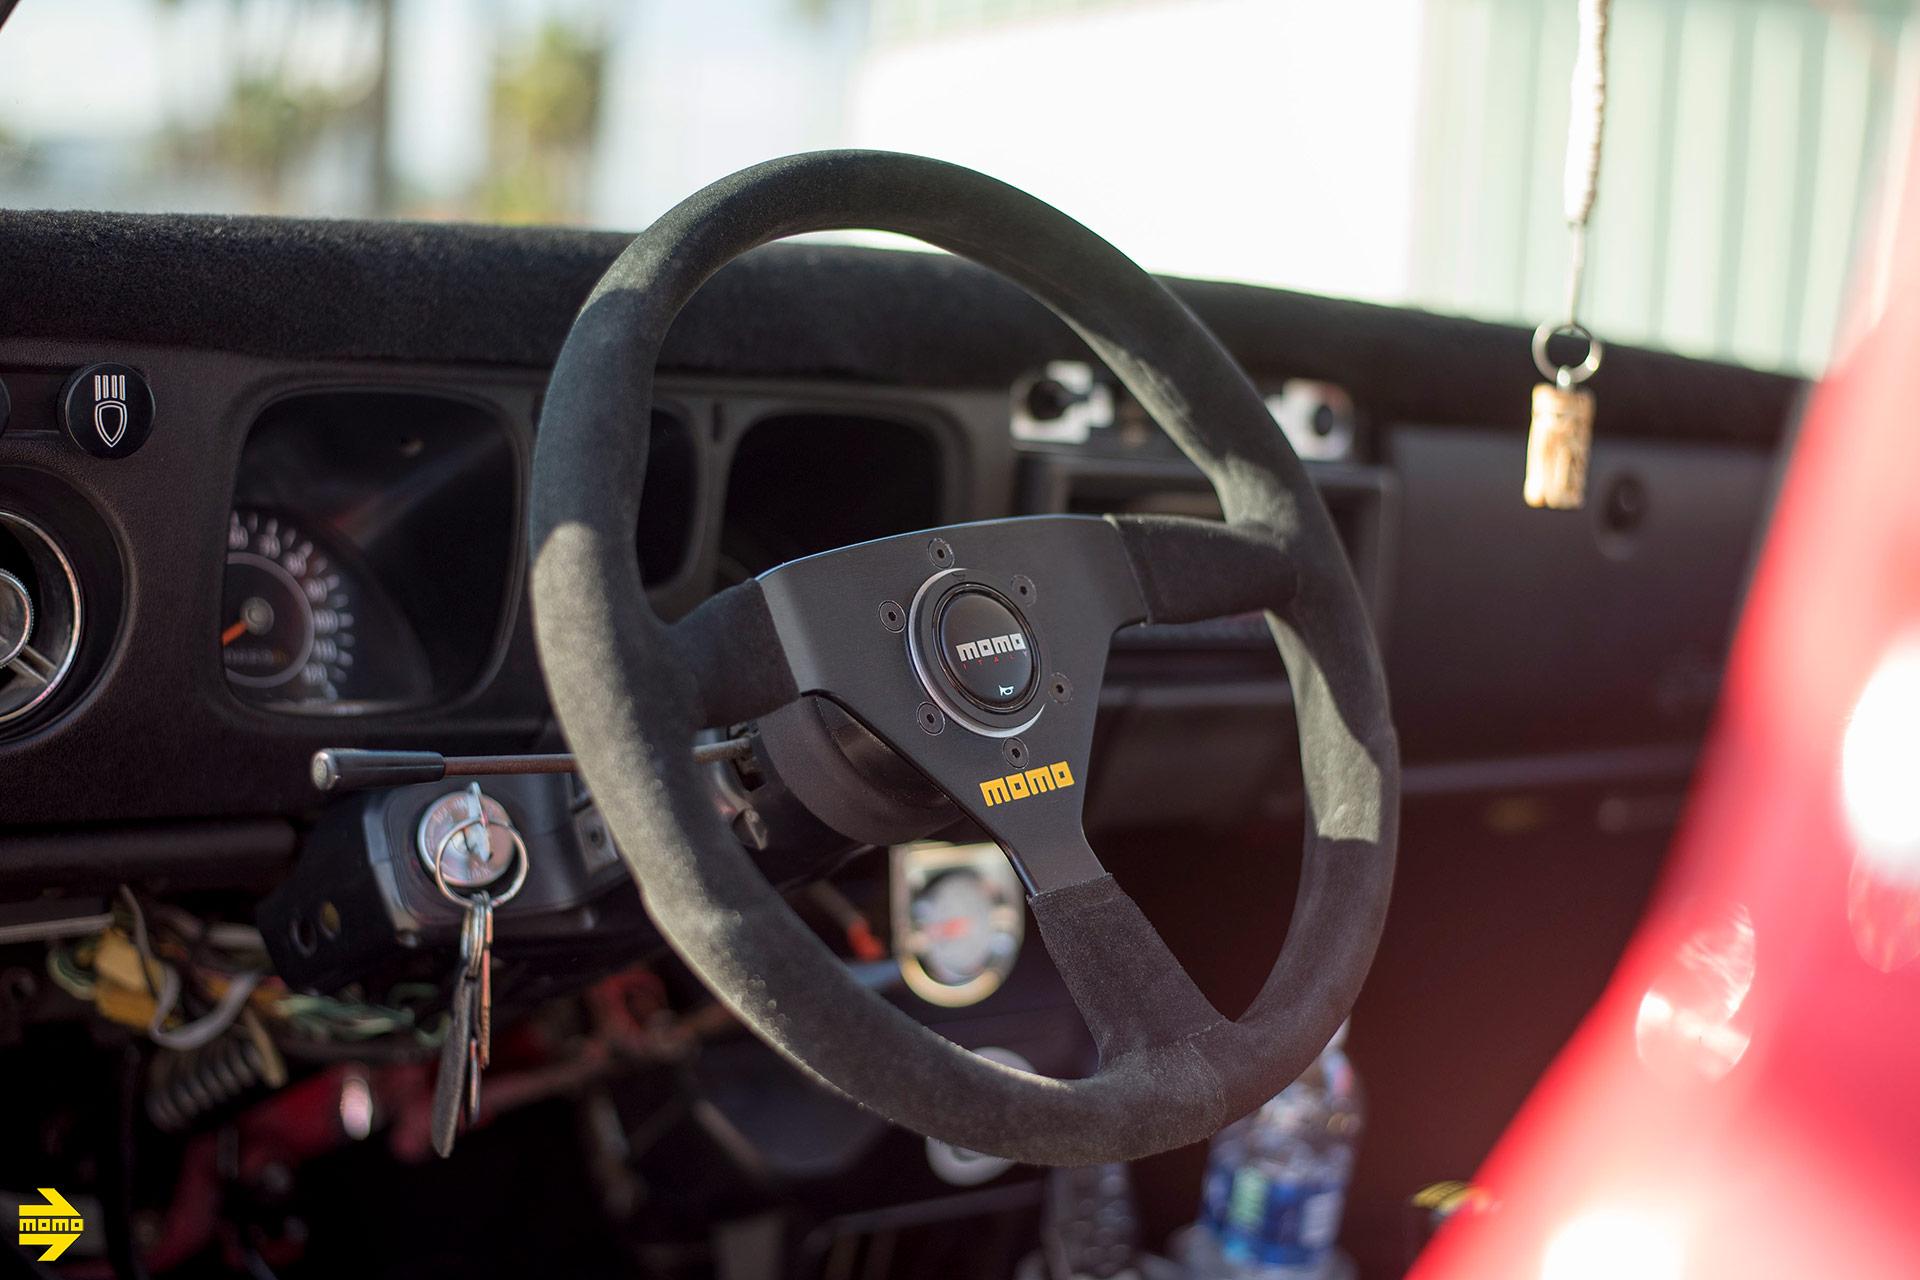 Red Datsun 510 Wagon - MOMO MOD. 69 - MOMO SK-50 Wheels in Black